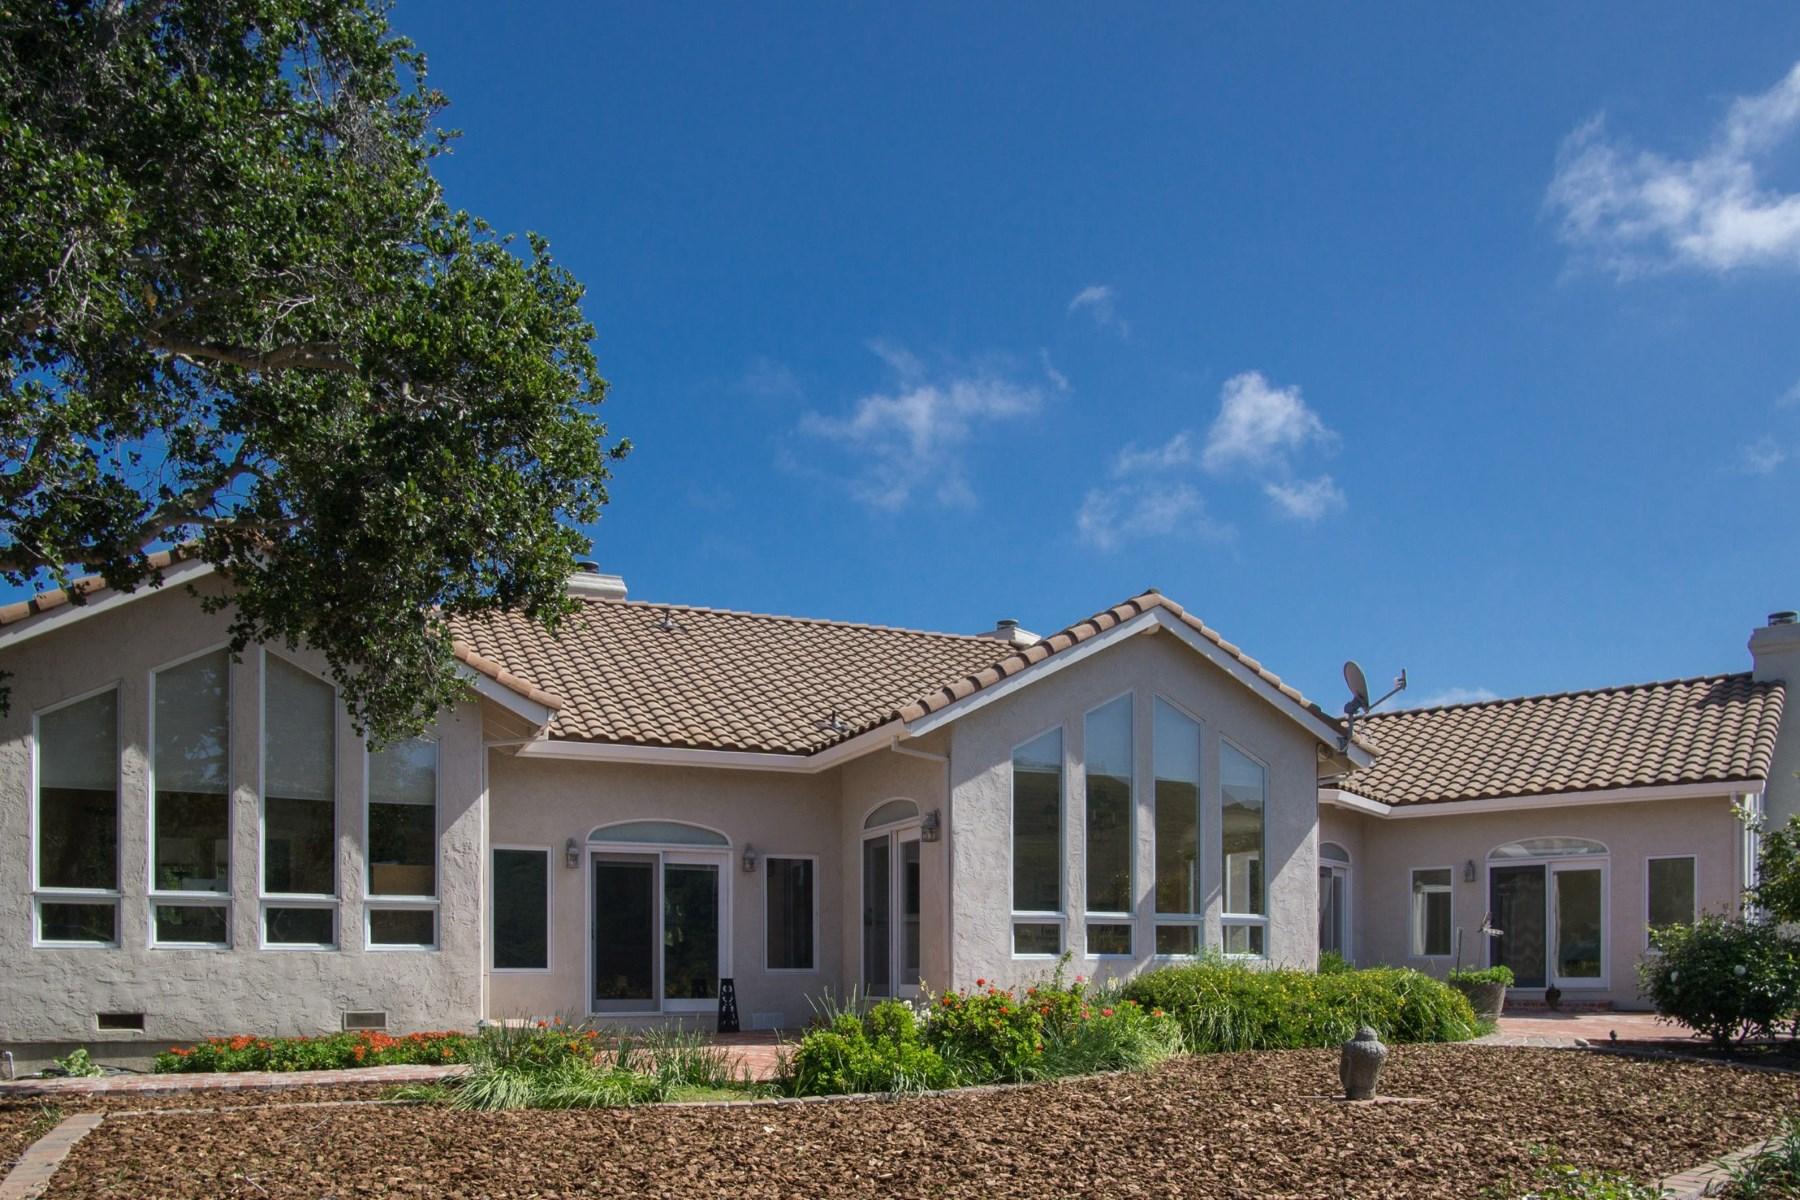 Single Family Home for Sale at Views, Views, Views 23830 Secretariat Lane Monterey, California, 93940 United States